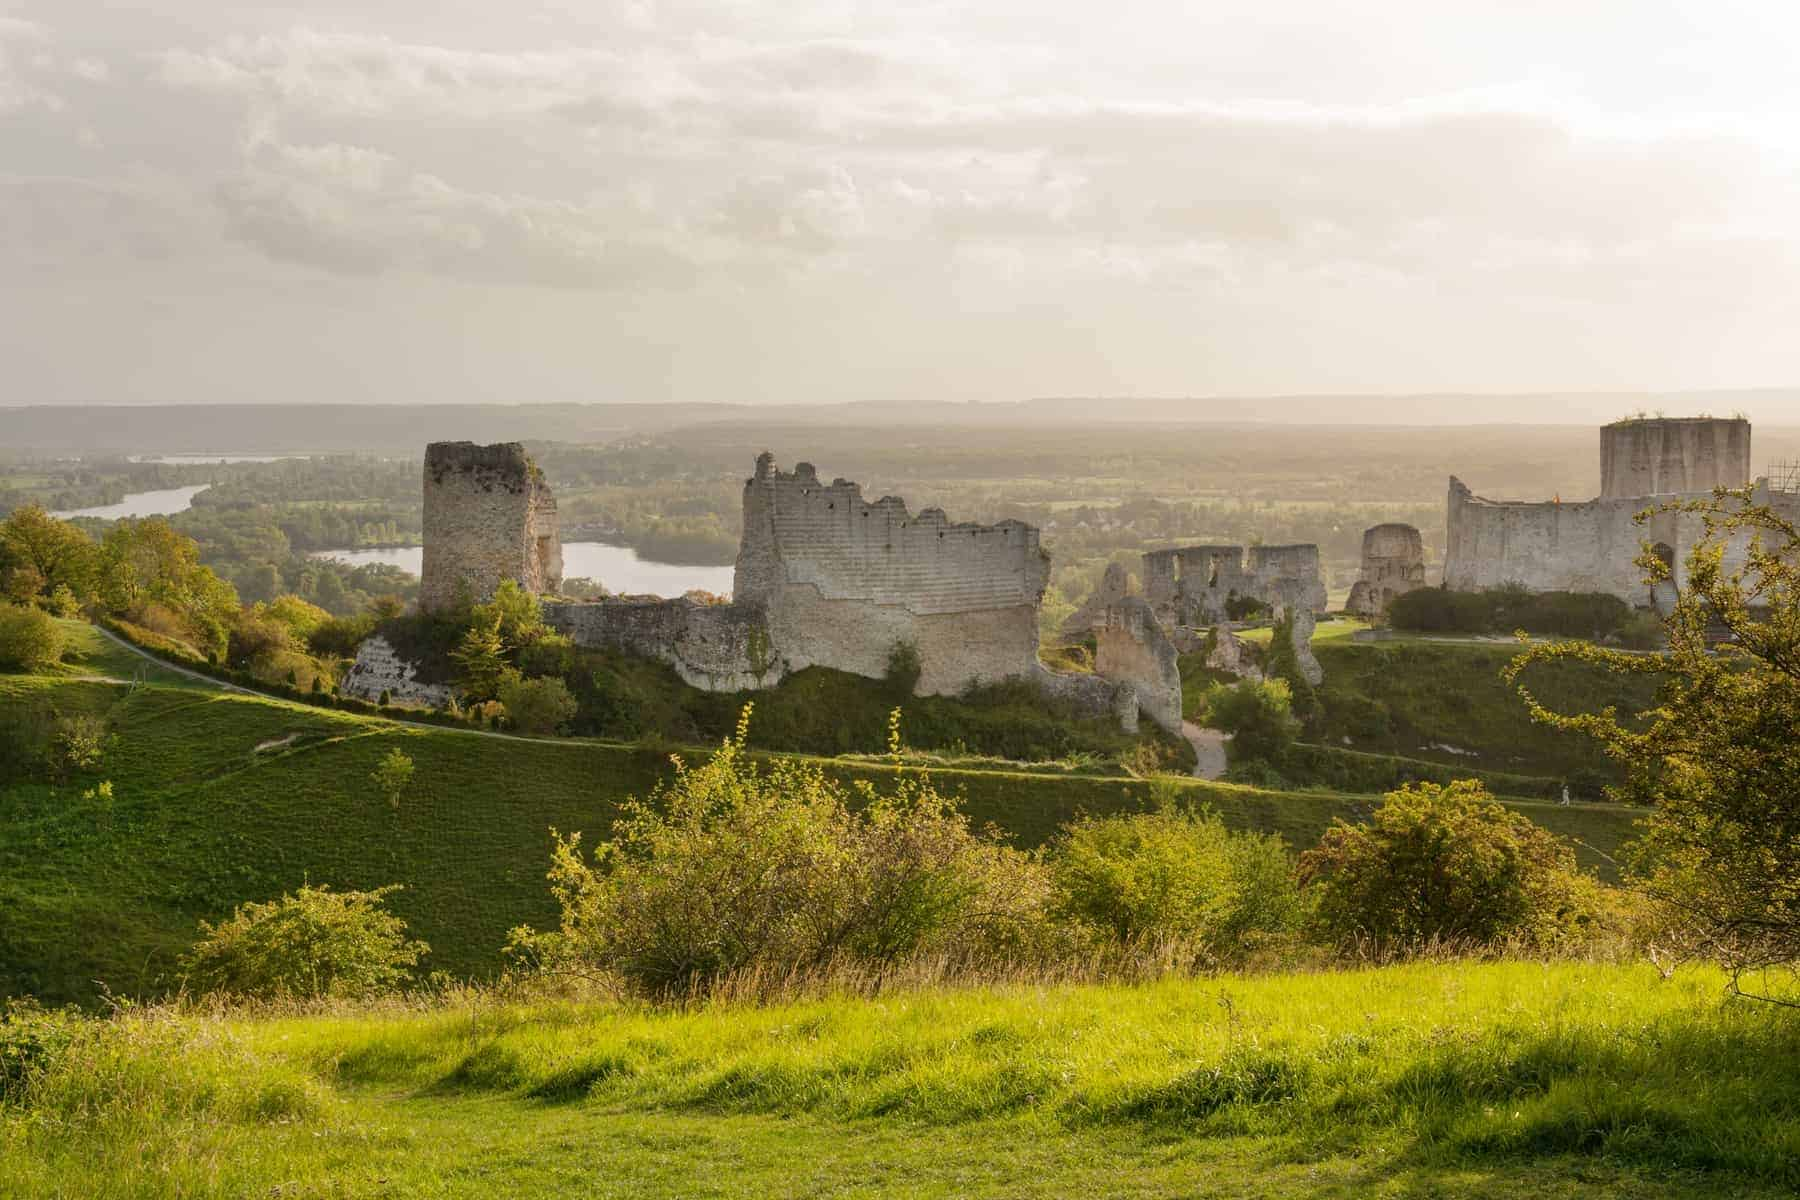 Chateau Gaillard, ruined famous castle of Richard the Lionheart, Normandy